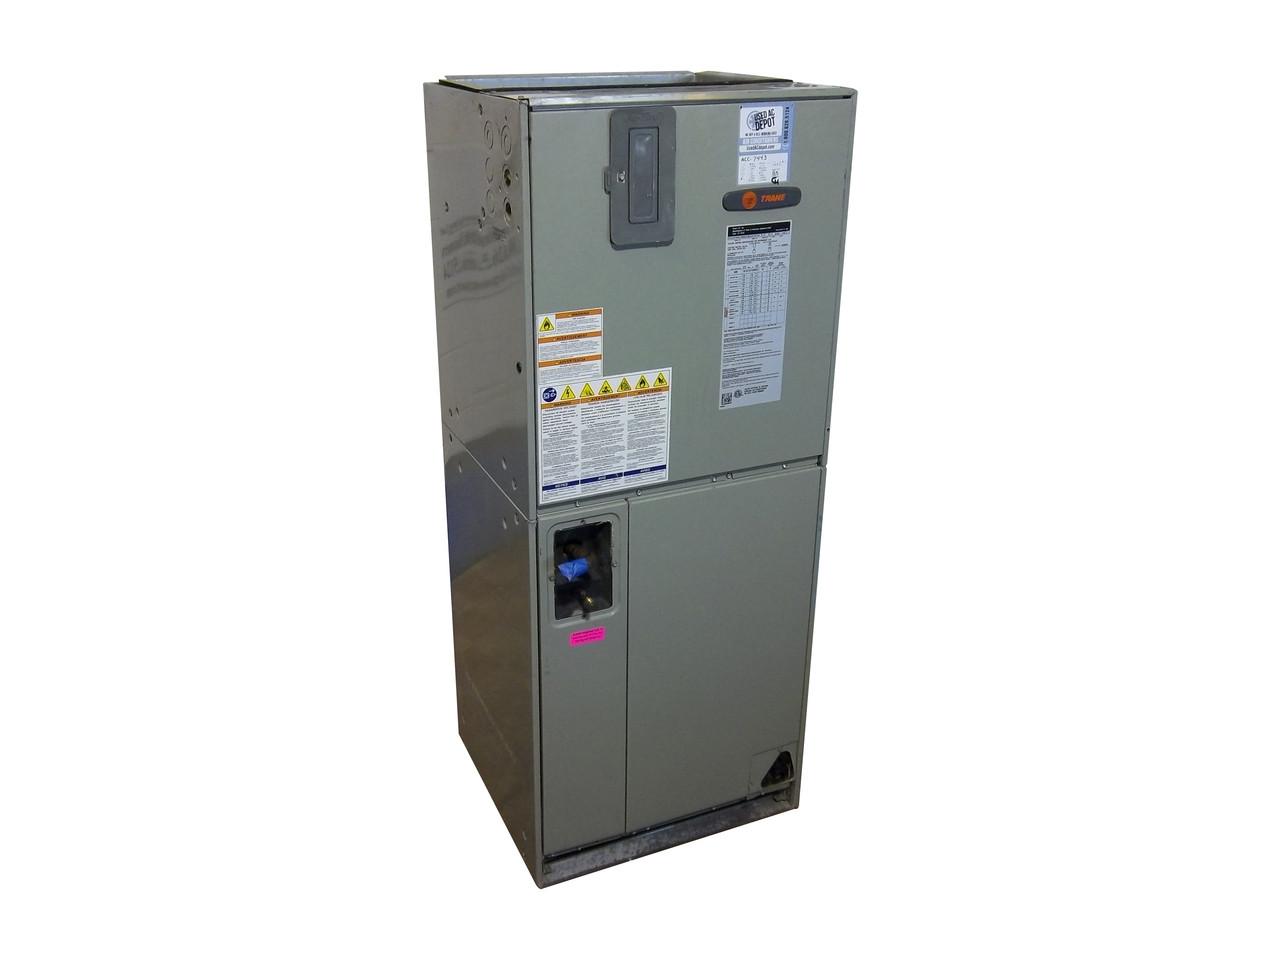 TRANE Used Central Air Conditioner Air Handler 4TEC3F60B1000AA ACC-7443